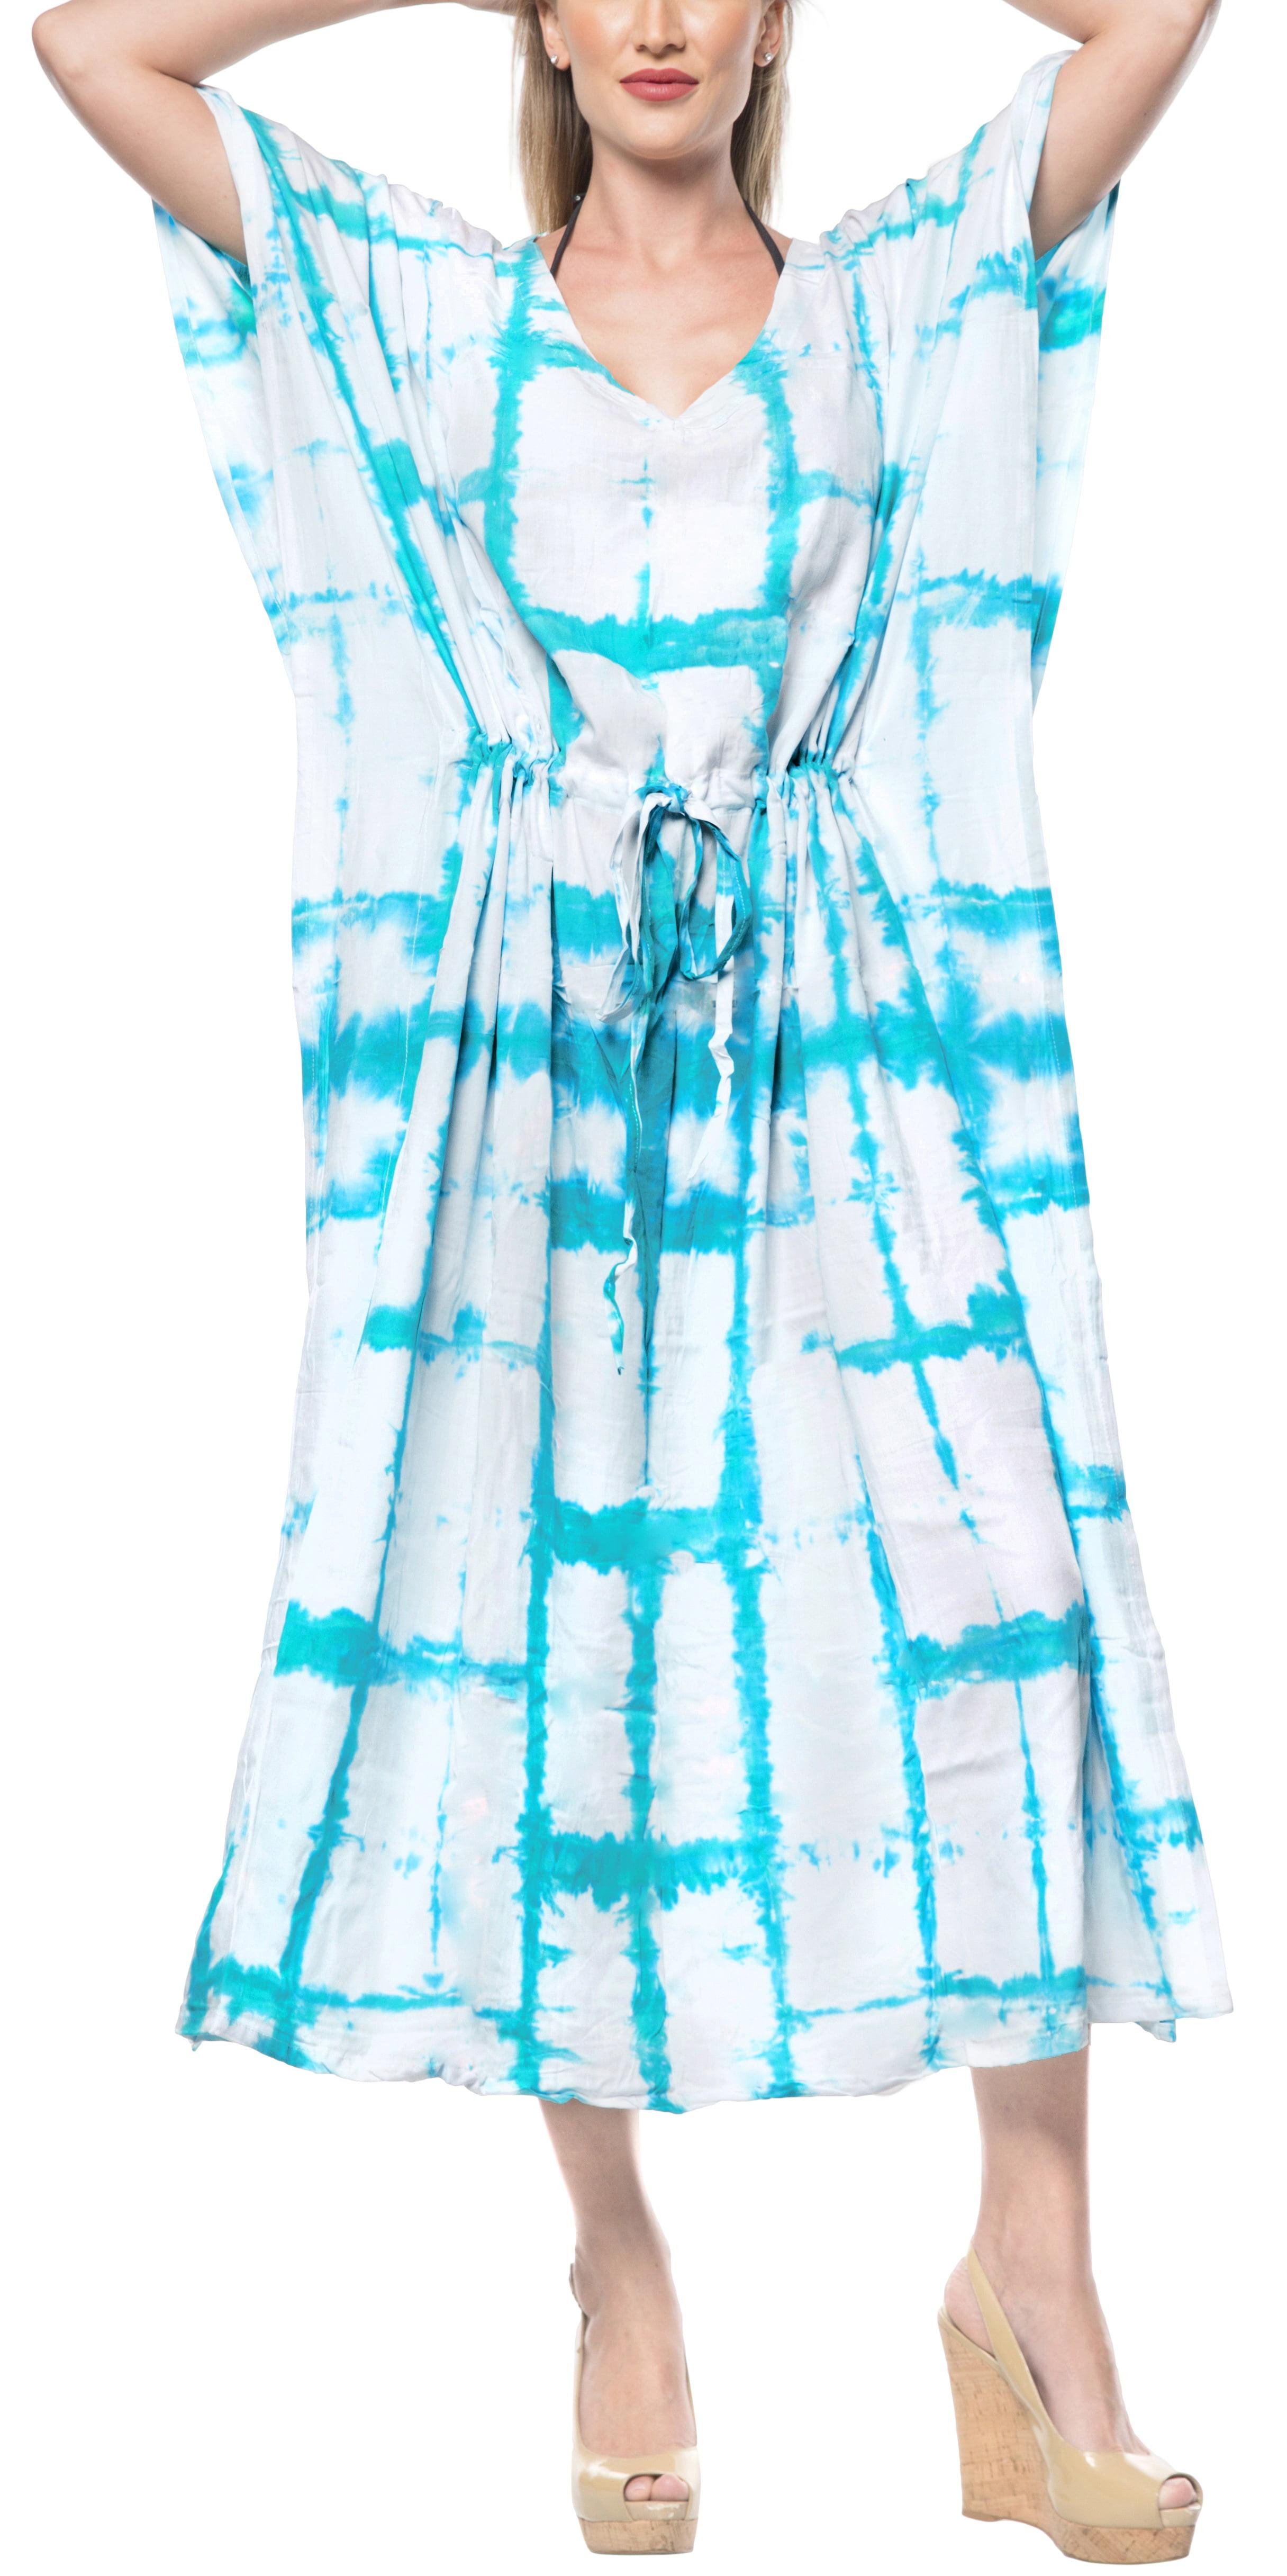 c6a7485d46 HAPPY BAY - Womens Stylish Gown Summer Maxi Dress Rayon Tunic Dress Free  Size Caftan Tie Dye Ladies kaftan - Walmart.com